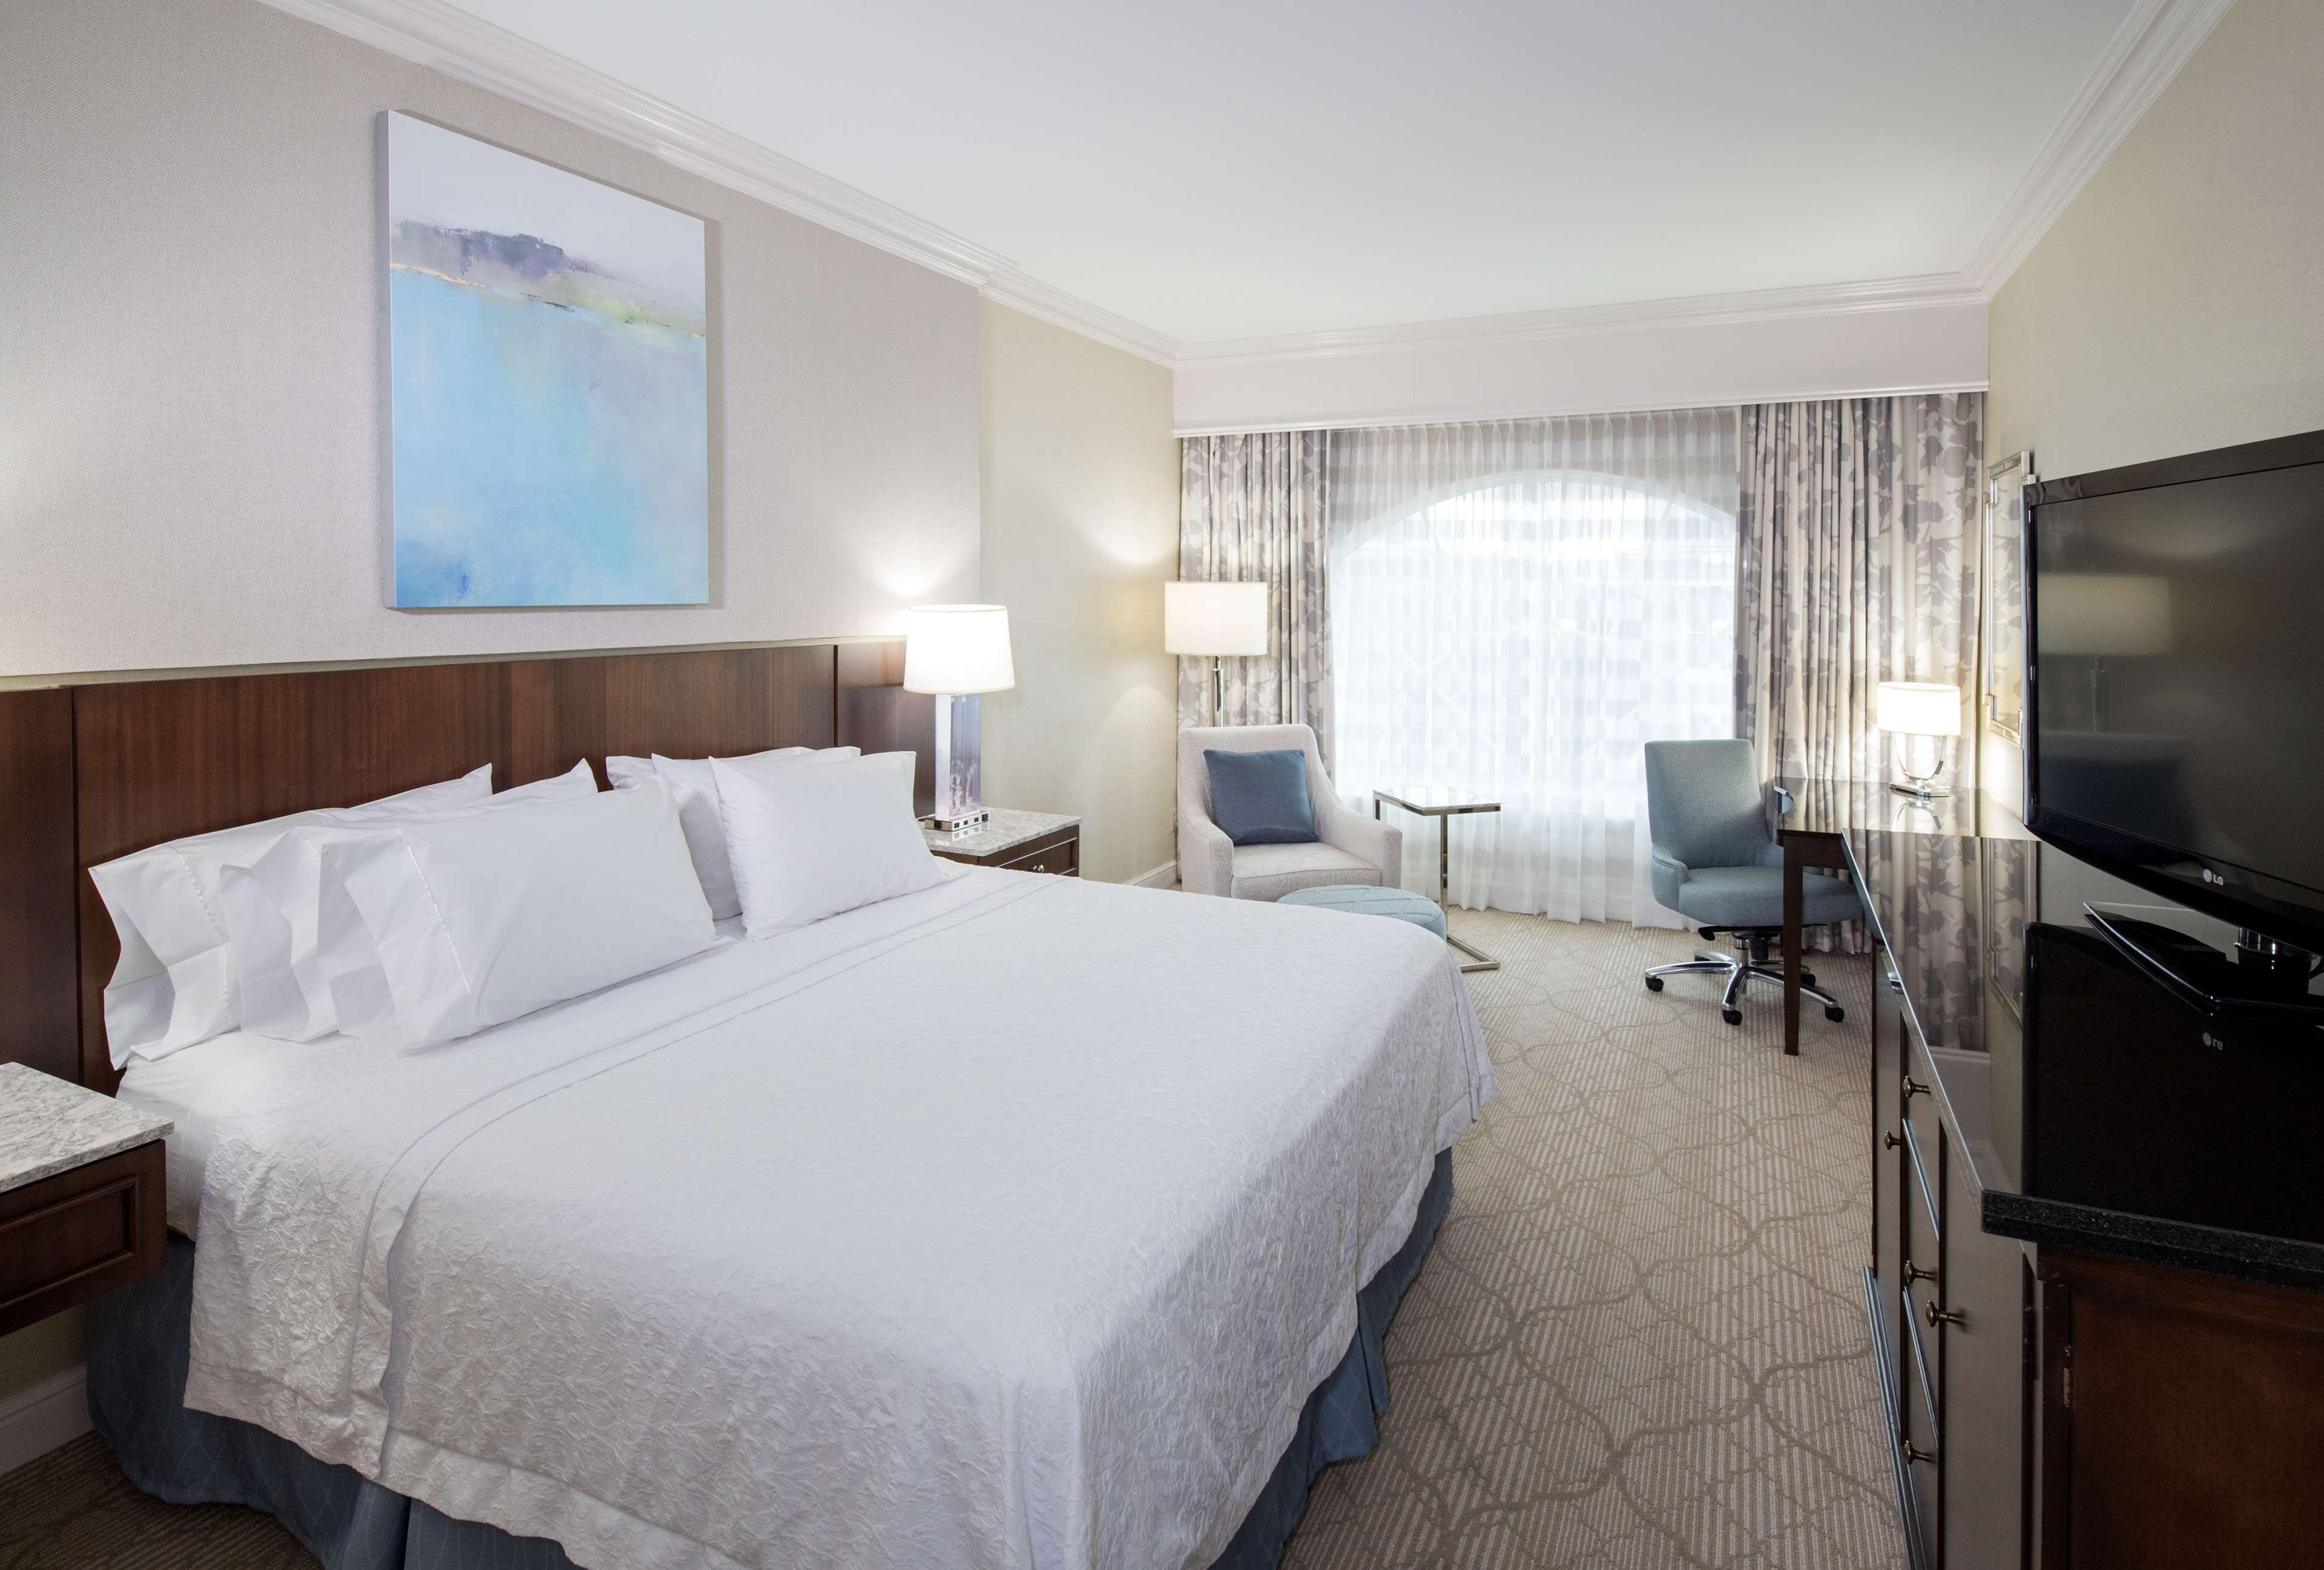 Hampton Inn & Suites Charlotte/South Park at Phillips Place image 48